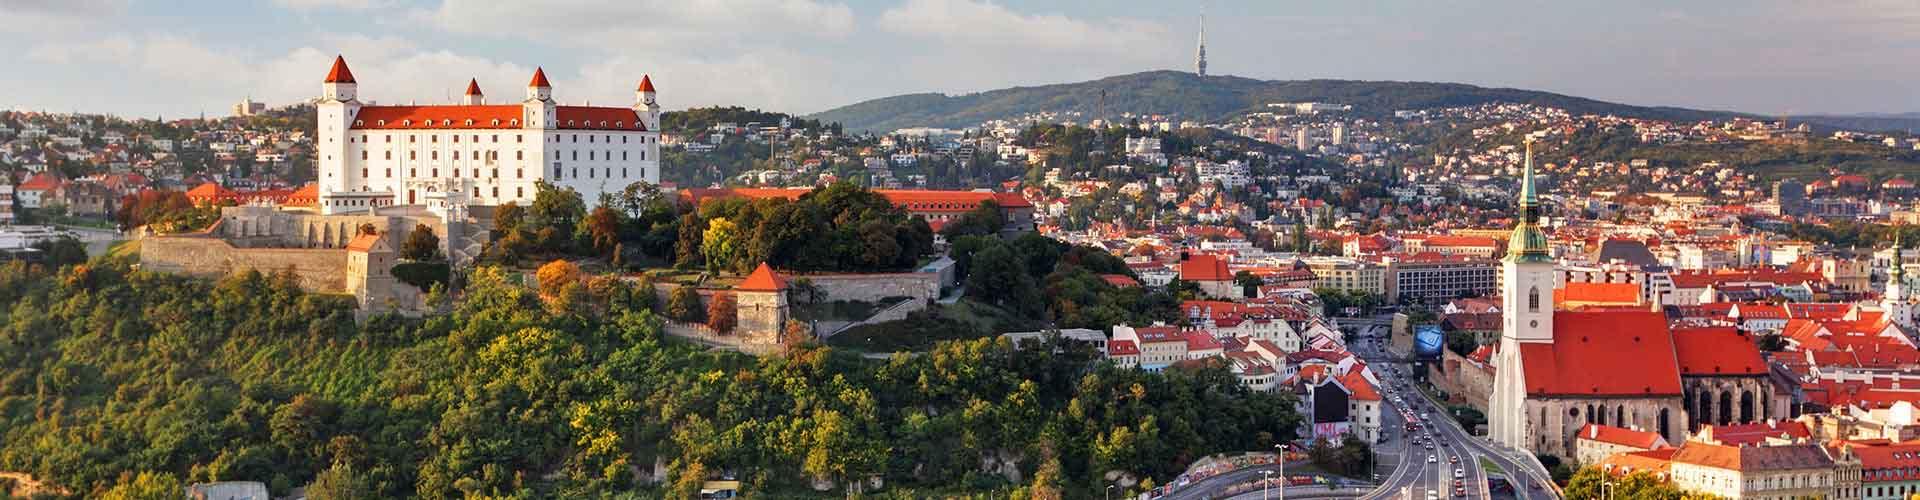 Bratislava - Campamentos en Bratislava. Mapas de Bratislava, Fotos y comentarios de cada Campamento en Bratislava.